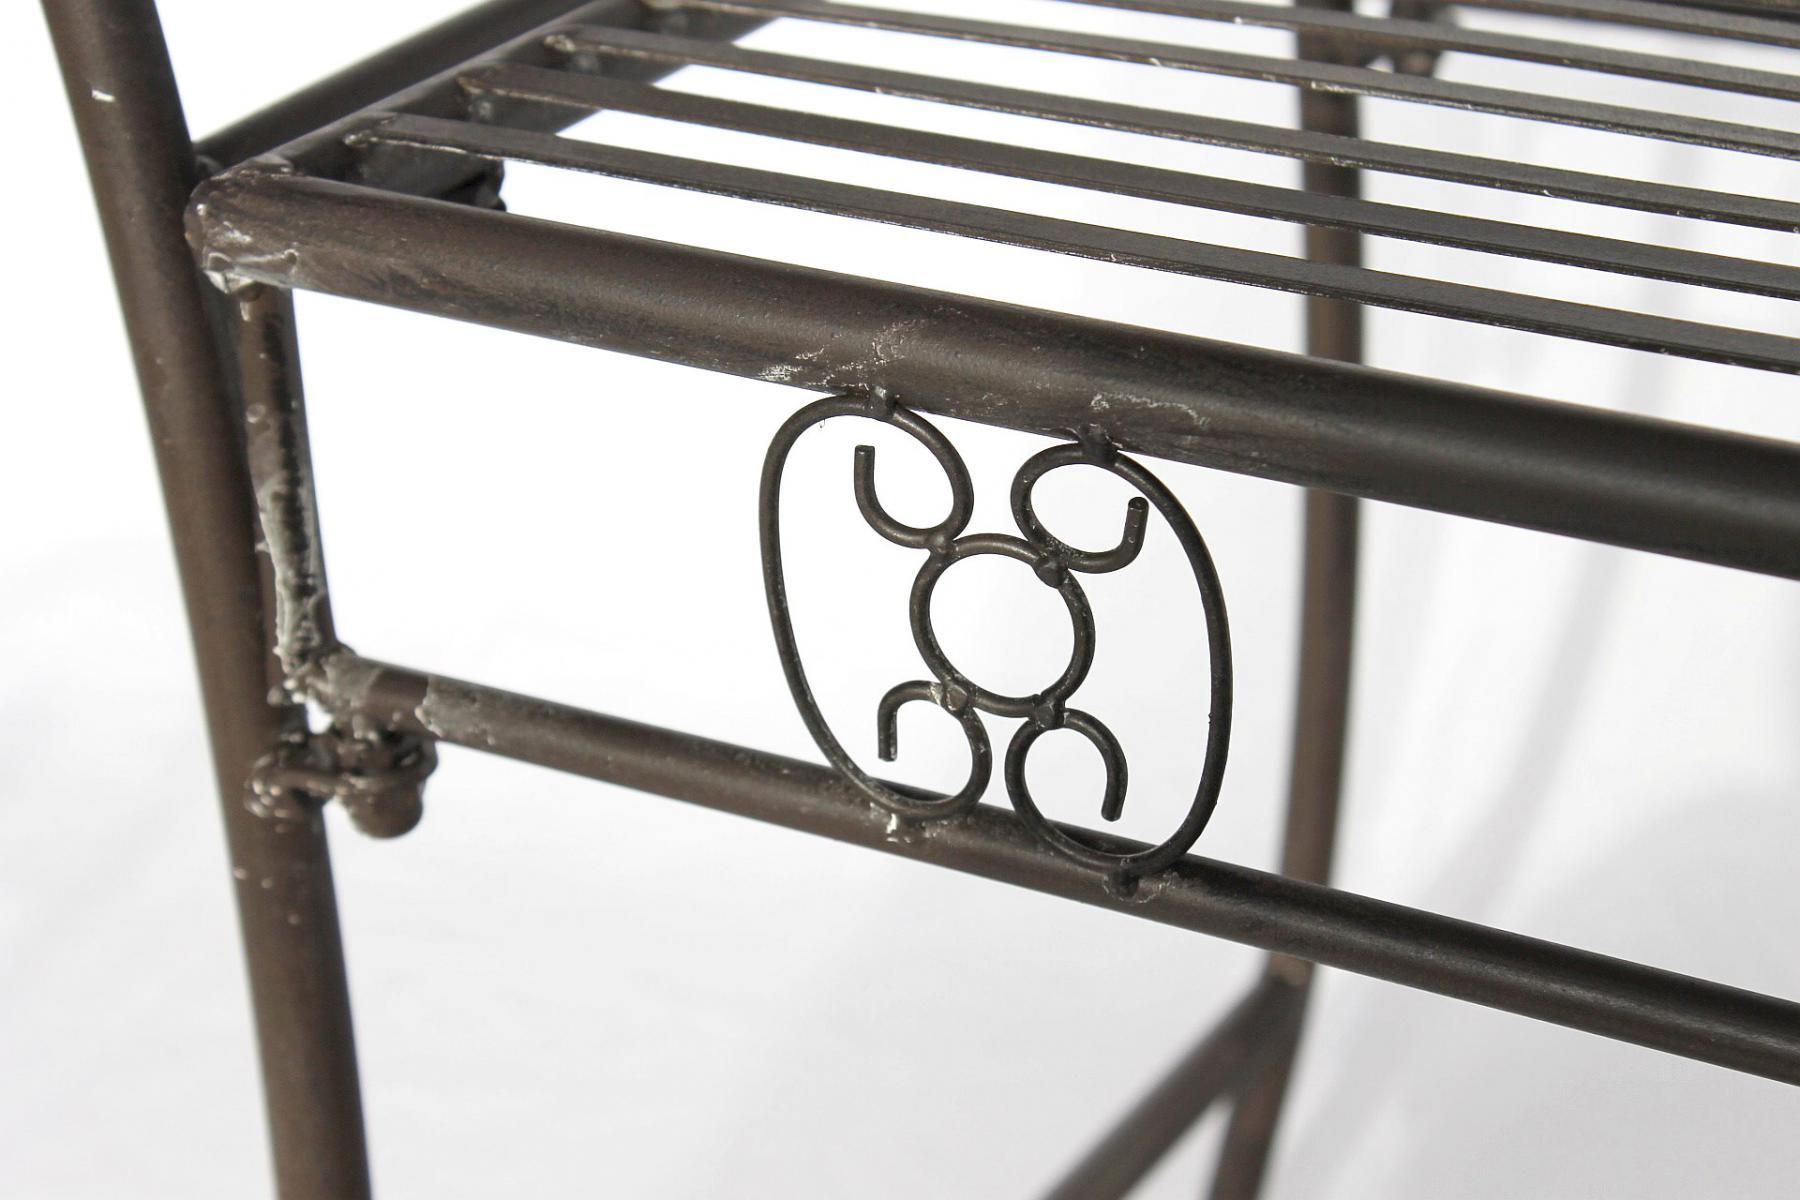 dandibo gartenbank wetterfest aus metall bank sitzbank 2 sitzer dy140491 braun 138 cm. Black Bedroom Furniture Sets. Home Design Ideas